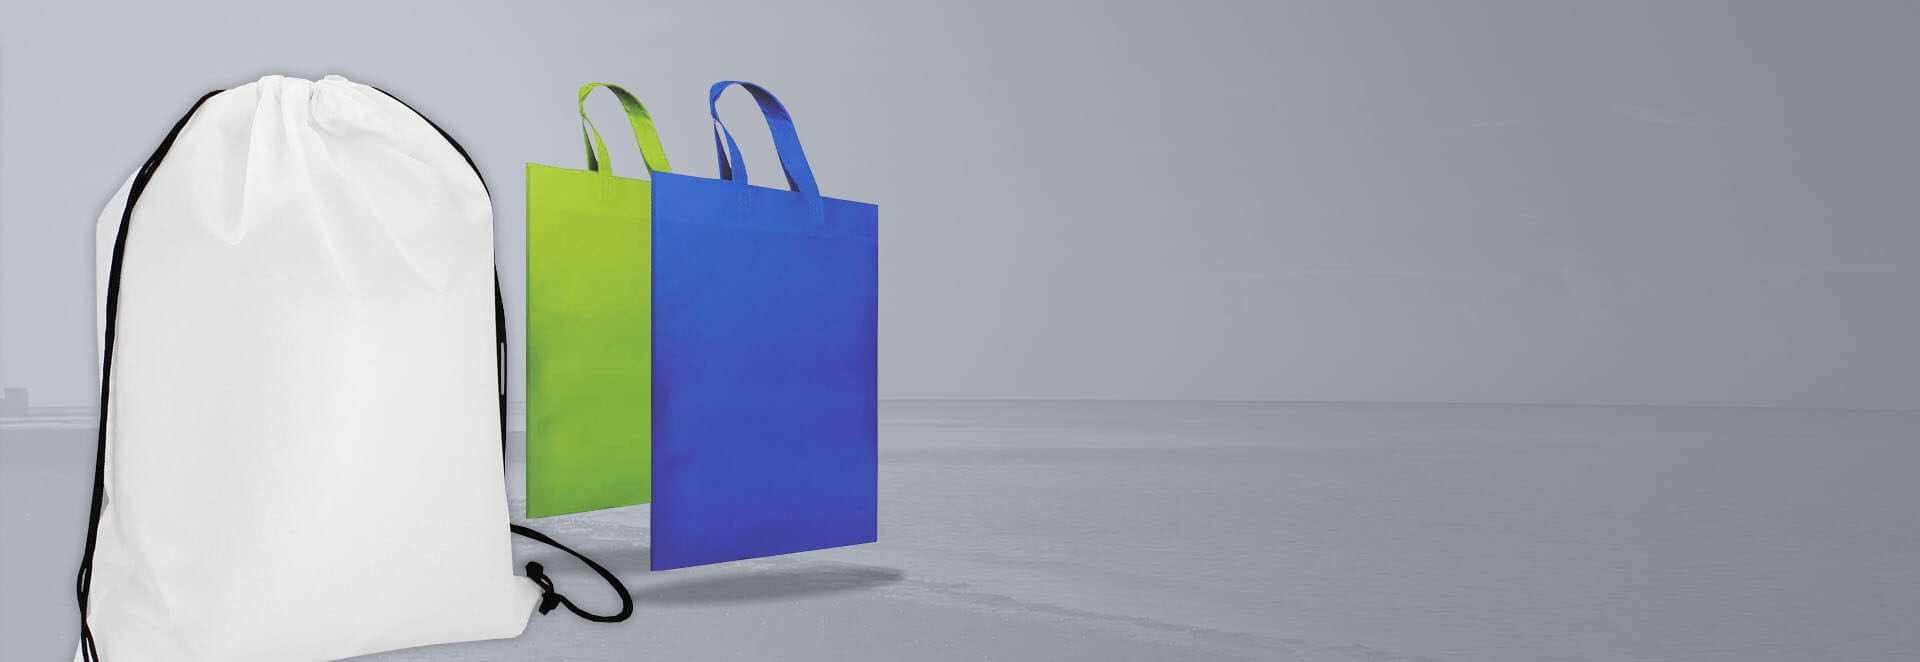 bolsas-ecologicas-morrales-personalizados